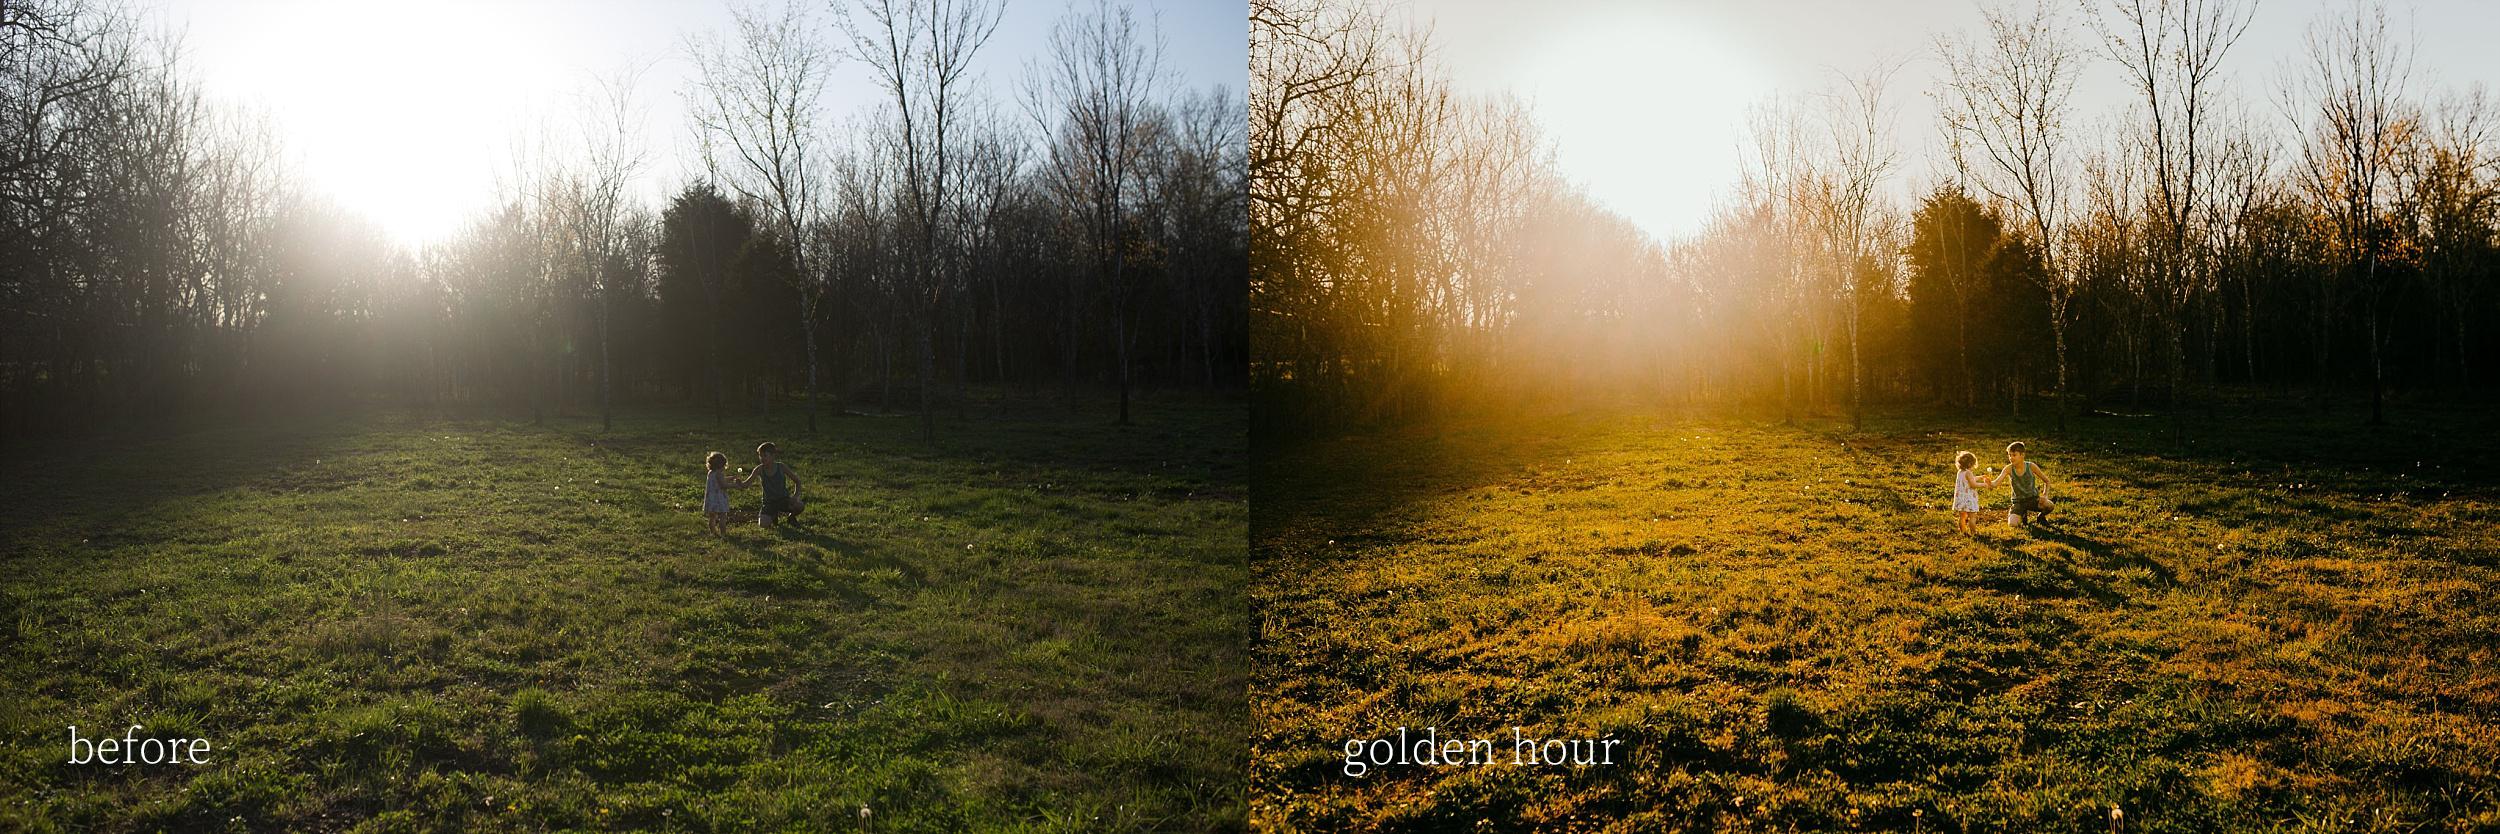 4. golden hour.jpg